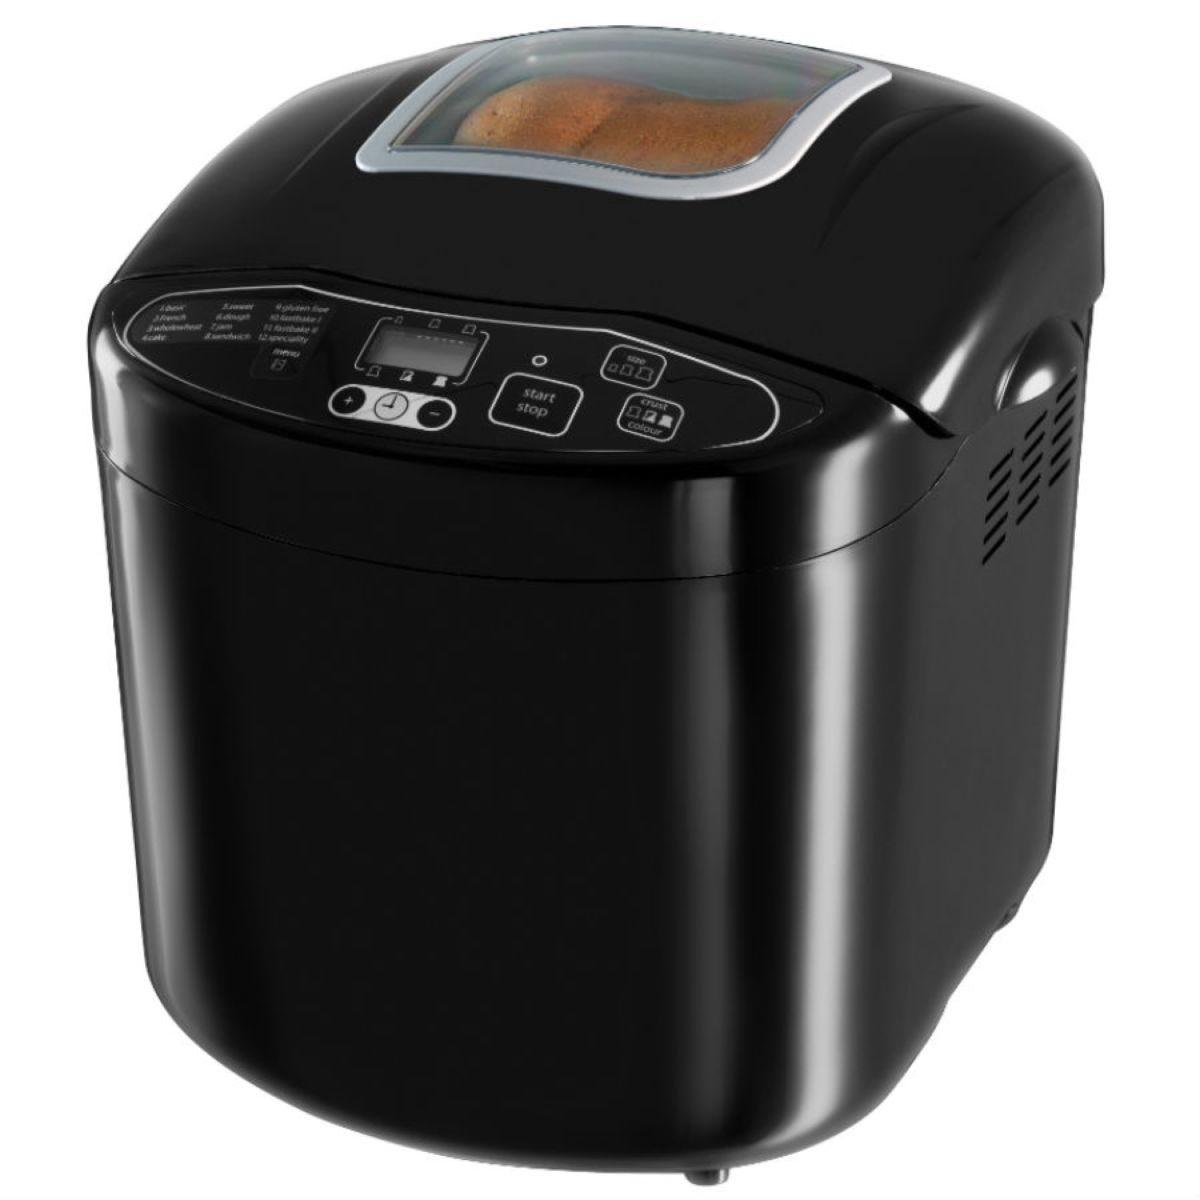 Russell Hobbs 23620 Fast Bake Breadmaker - Black